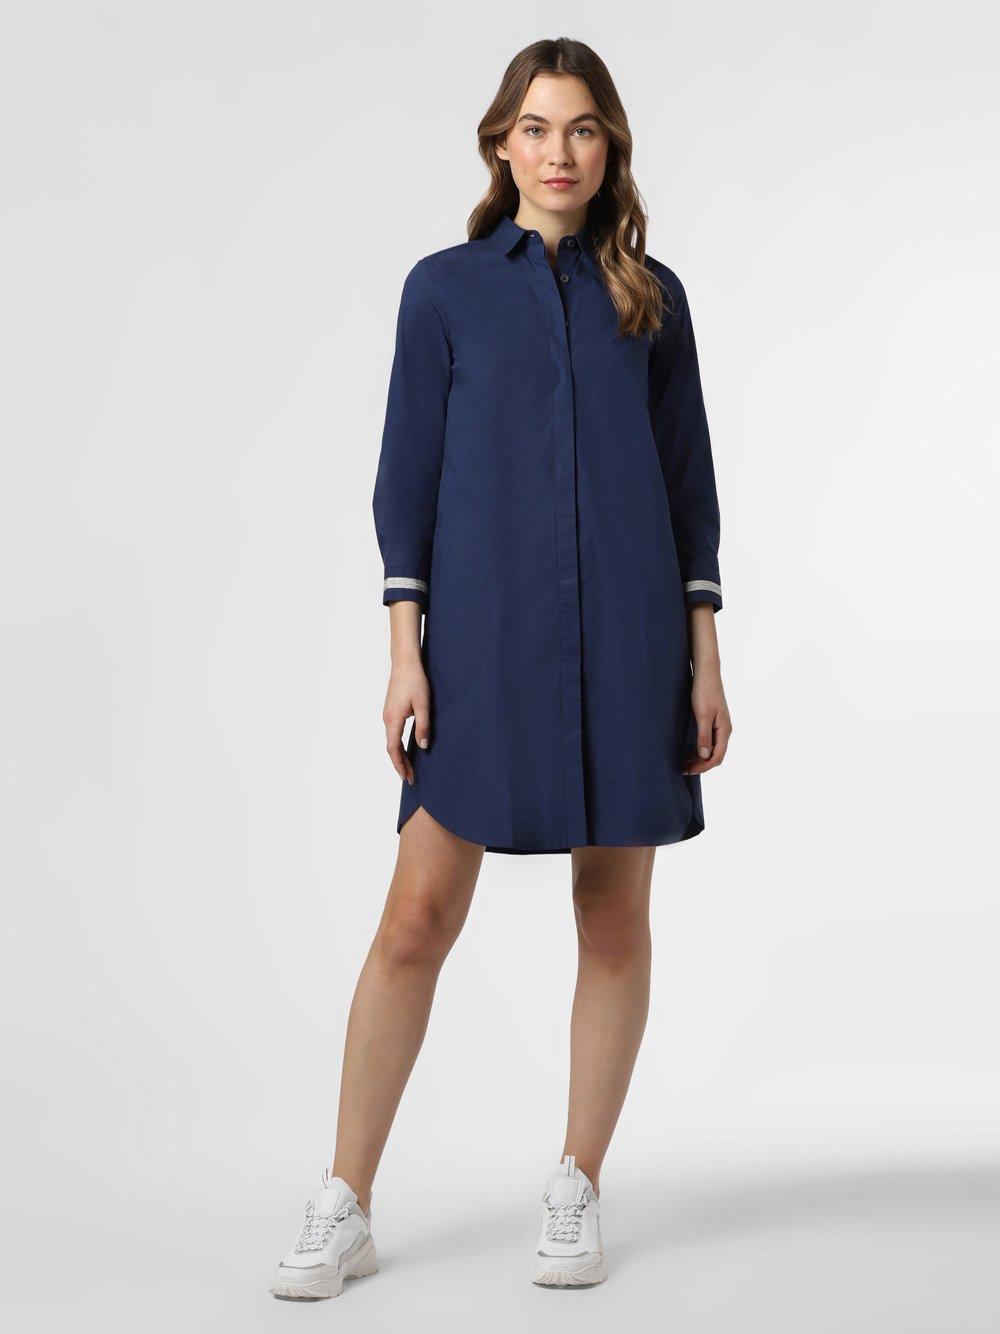 0039 Italy – Sukienka damska, niebieski Van Graaf 464288-0001